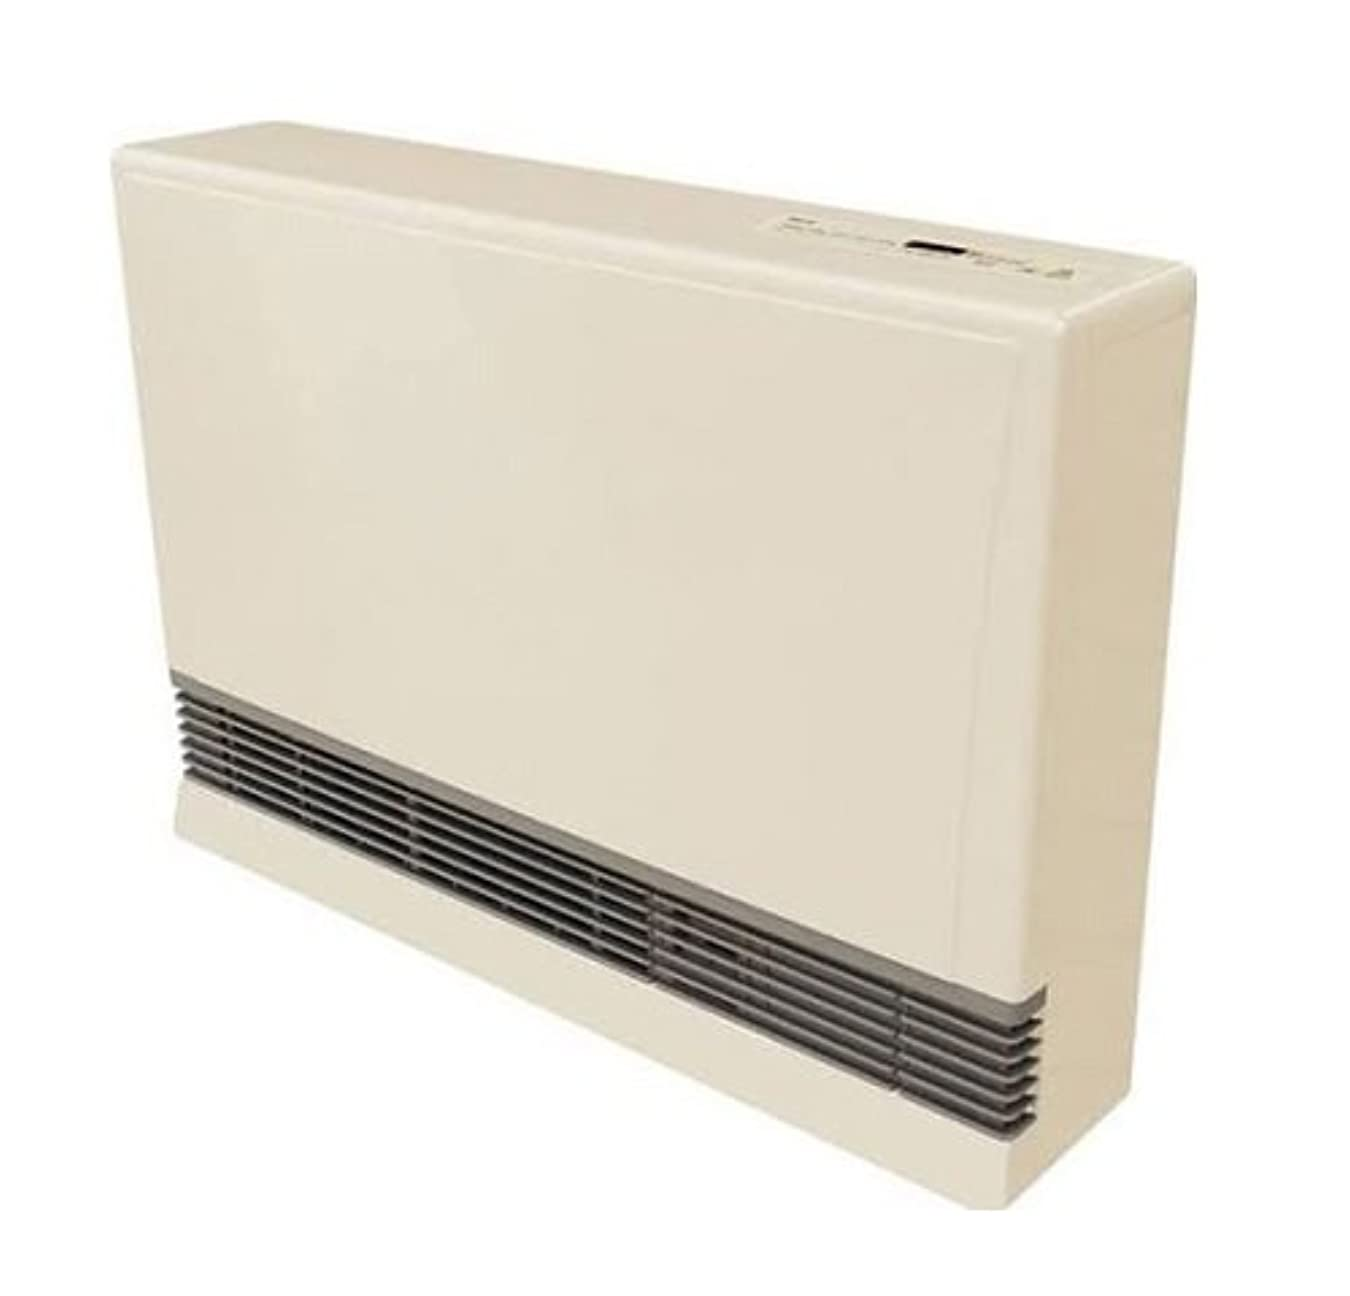 Rinnai EX38CTLP Direct Vent Space Heater - Liquid Propane BEIGE, 141[並行輸入]